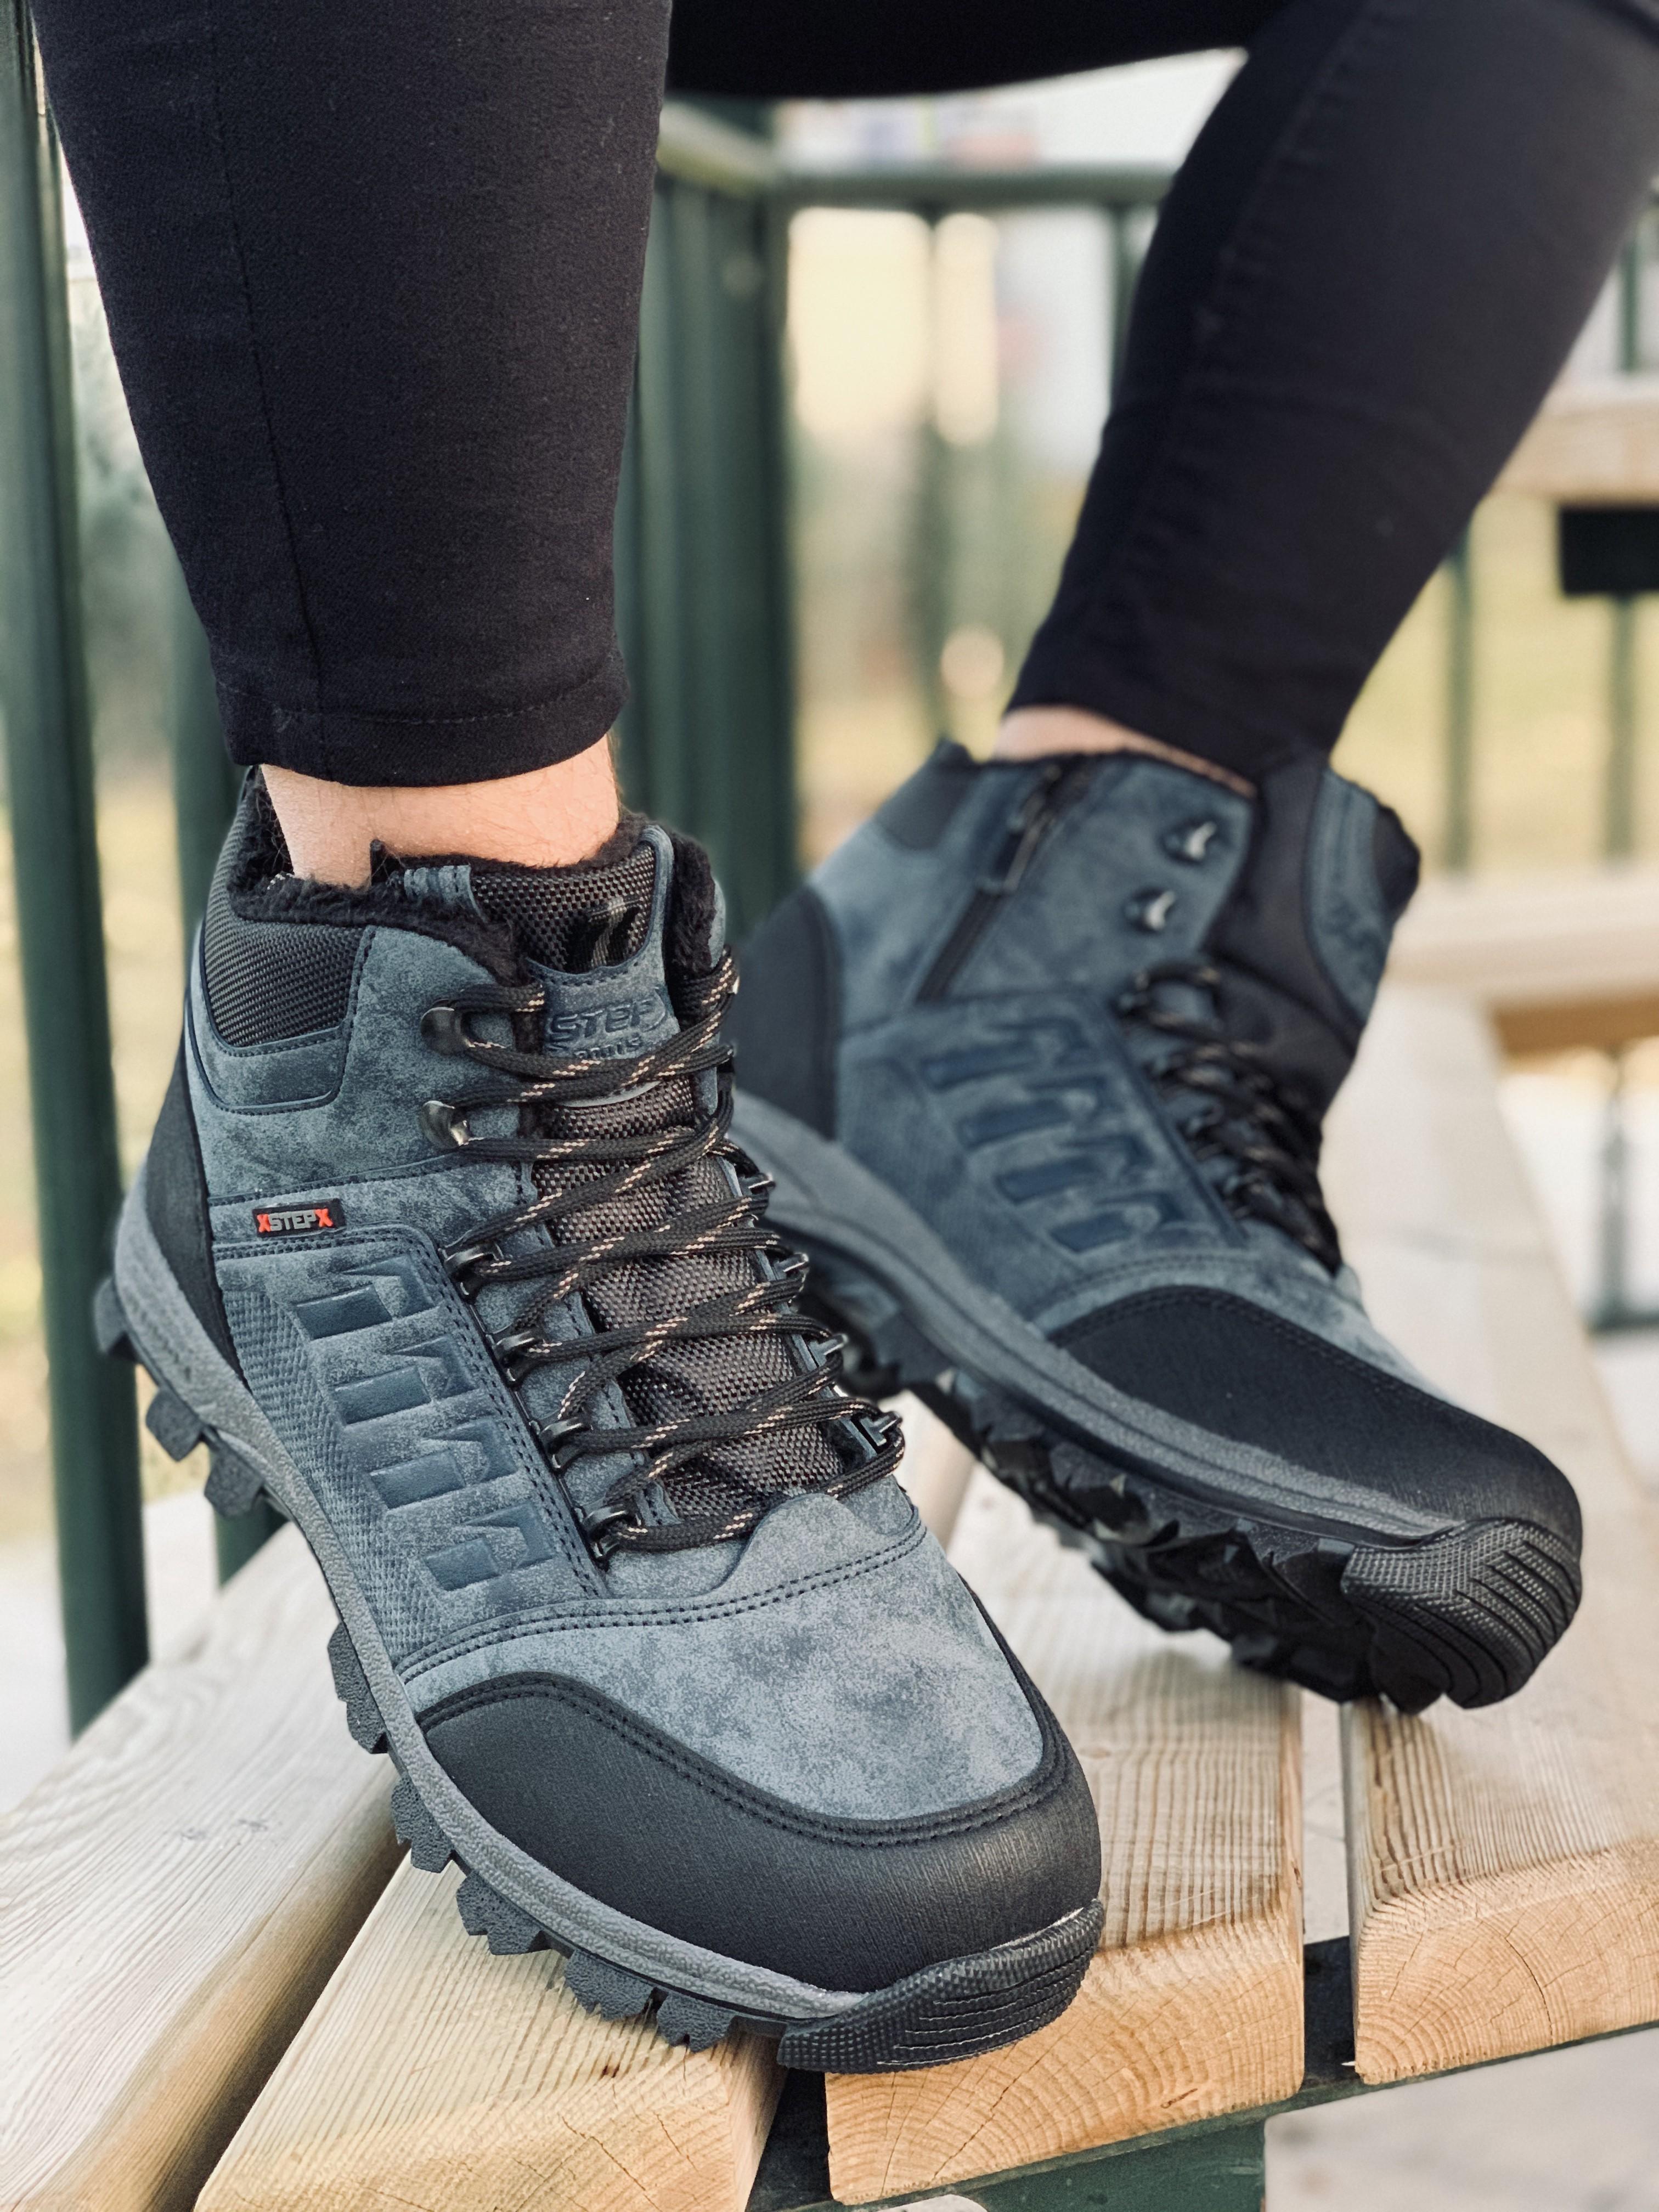 Men's Big Size Side Zipped Lace-up Semi-Cut Hiking Boots